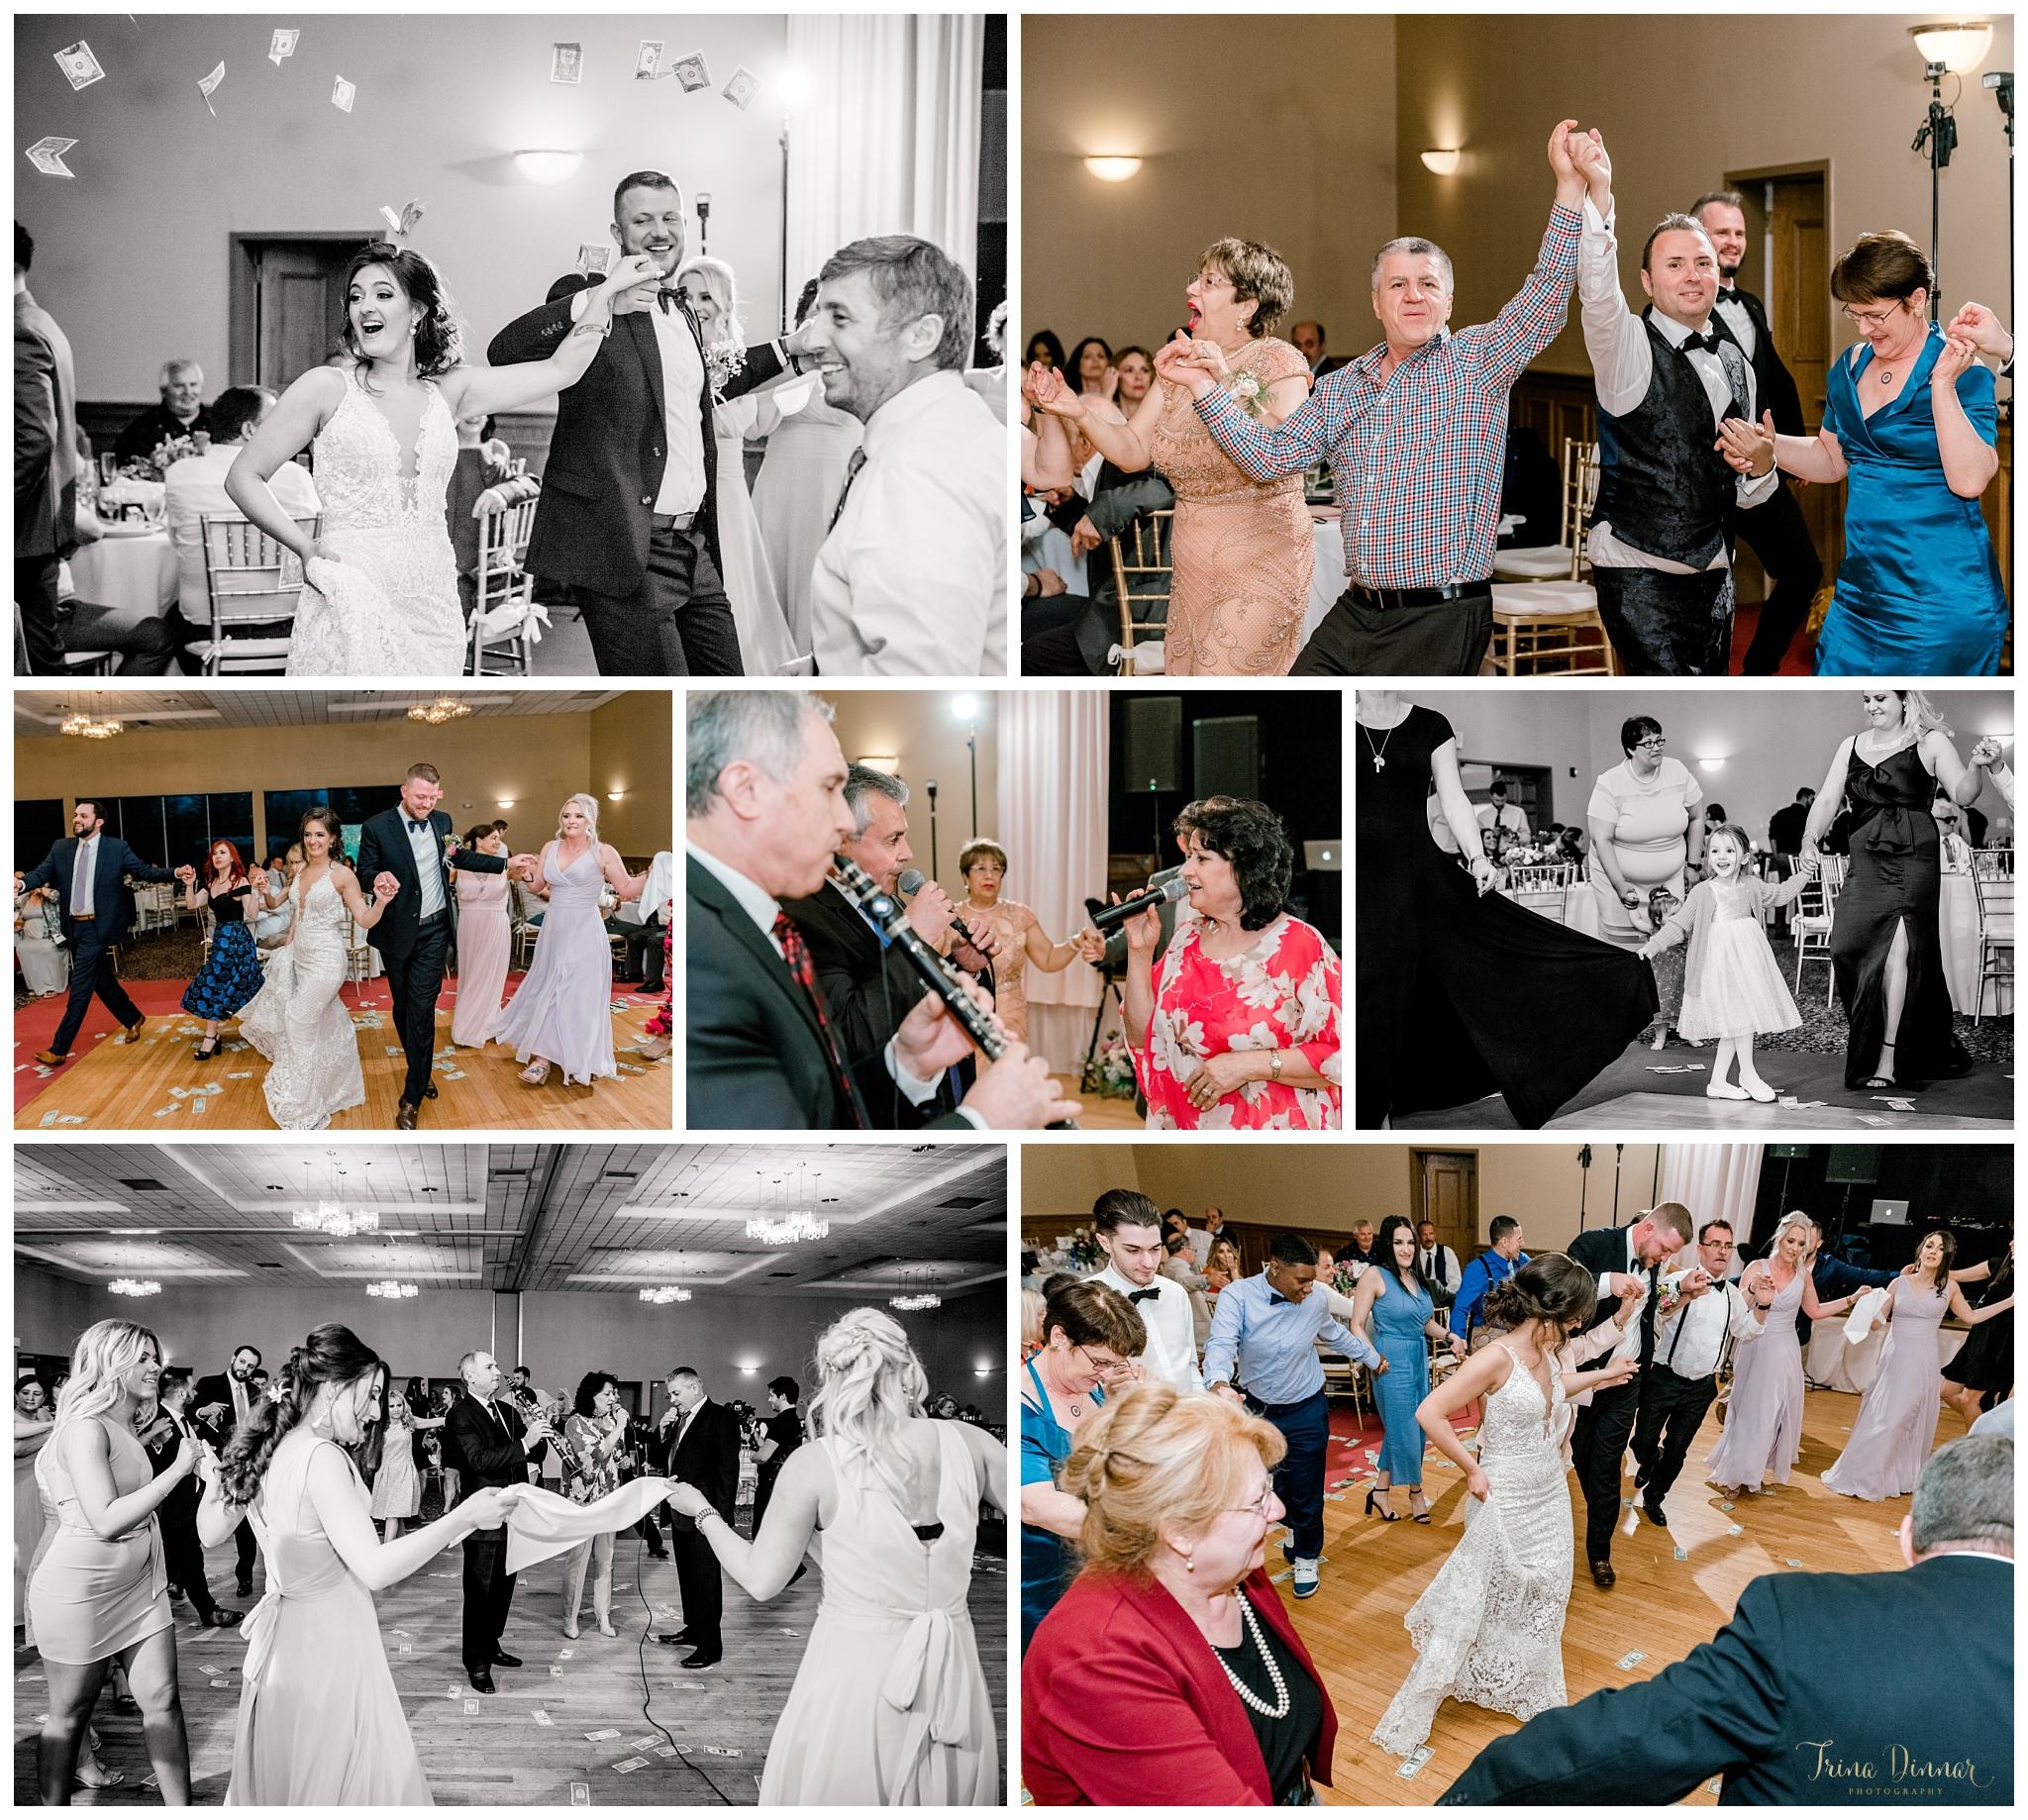 Traditional Greek Wedding Dancing at Sunday River